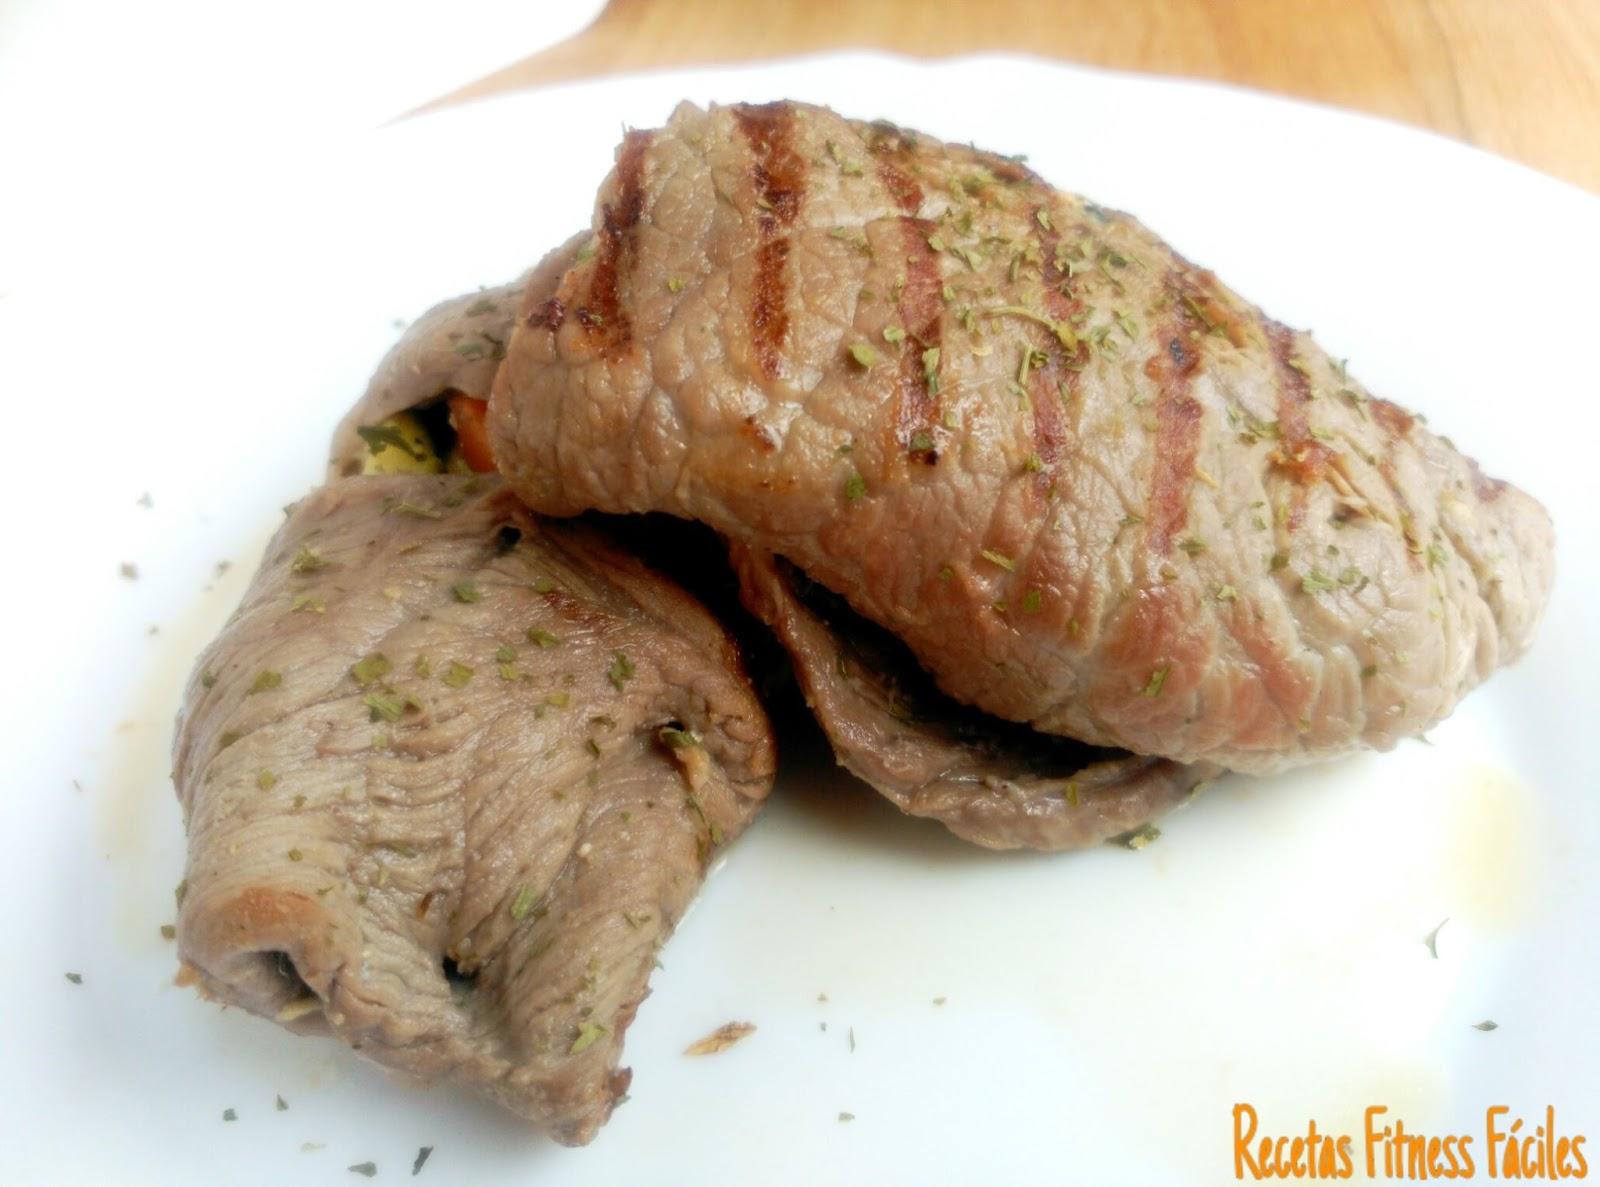 Filetes de ternera rellenos de verduras al horno Recetas Fitness